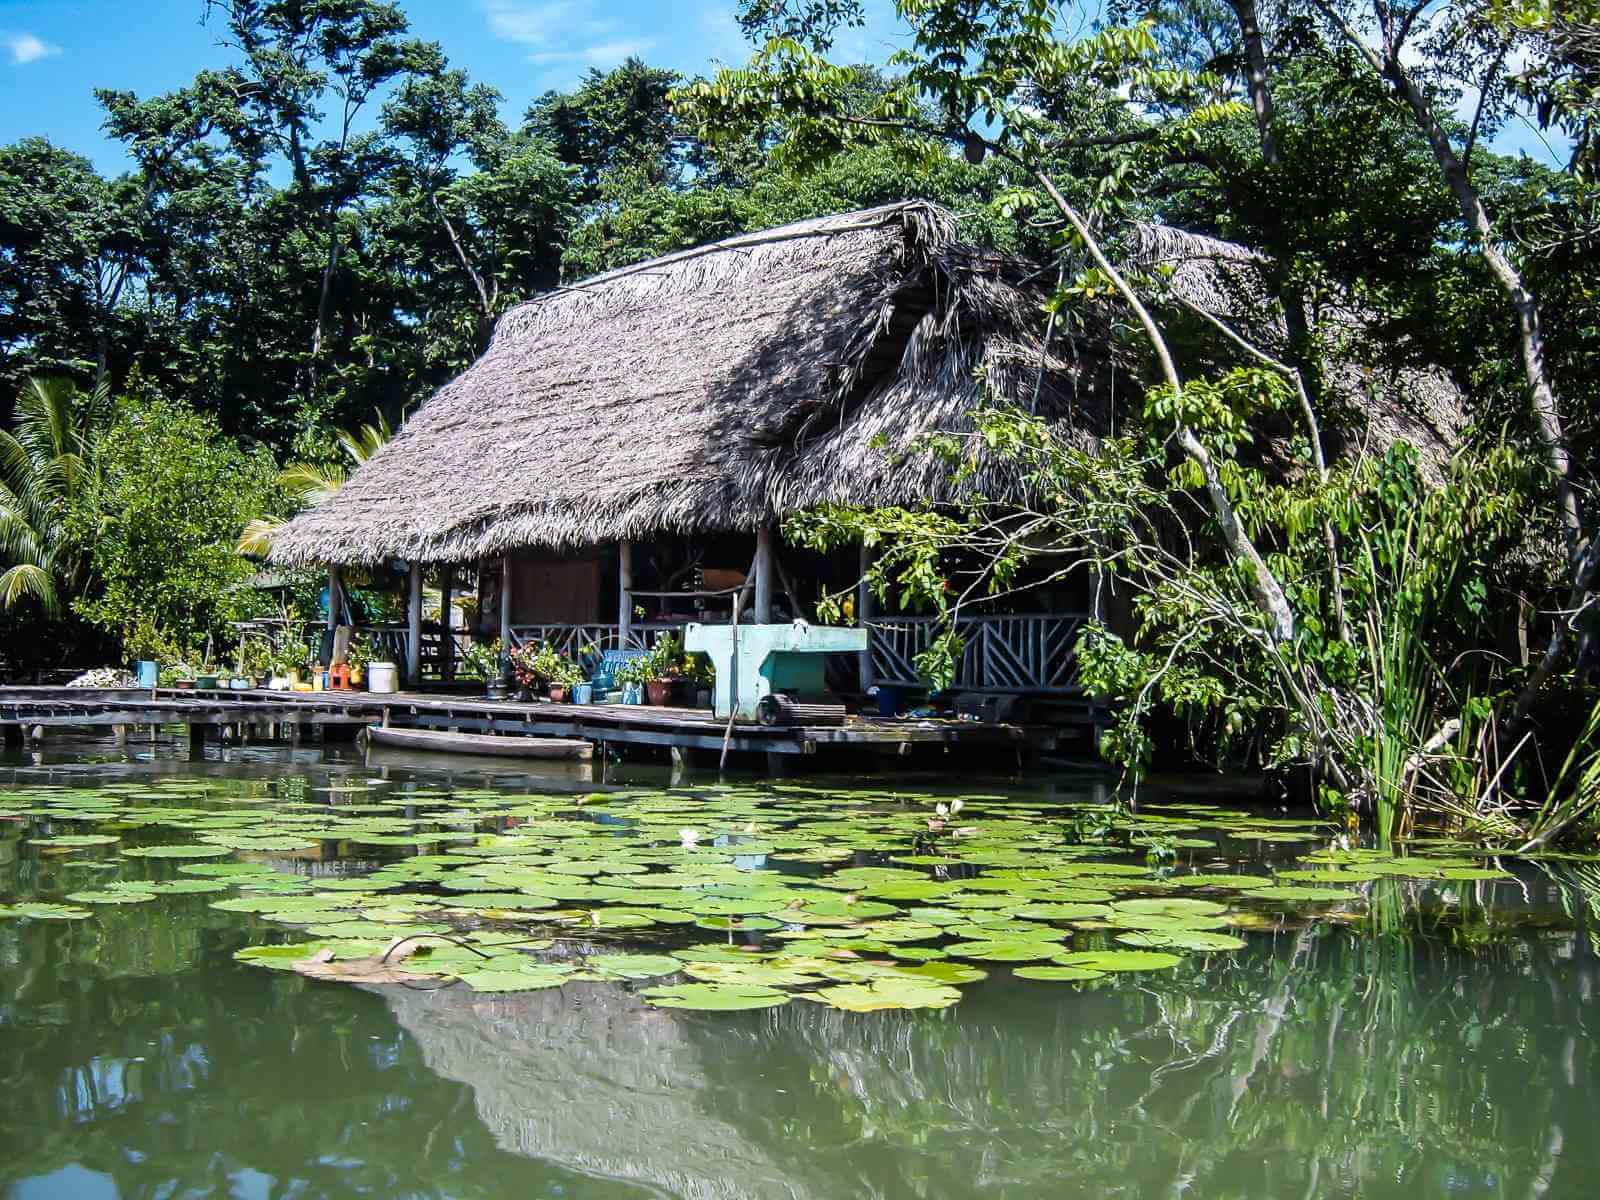 Rio Dulce - Idyllische houten huisjes lang de rivier